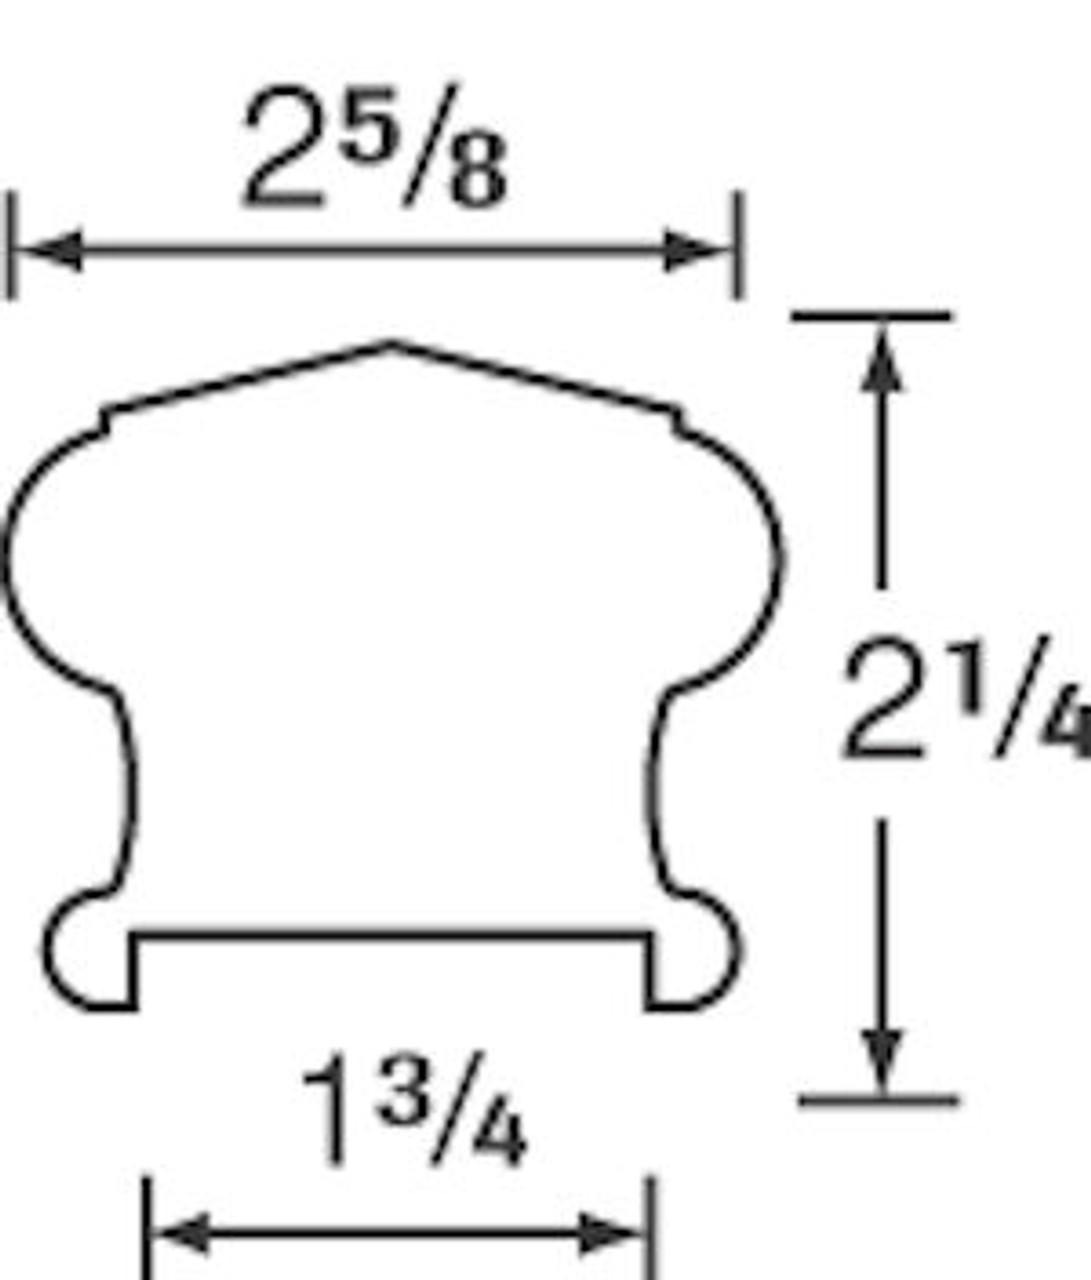 6310P Plowed Handrail Dimensional information